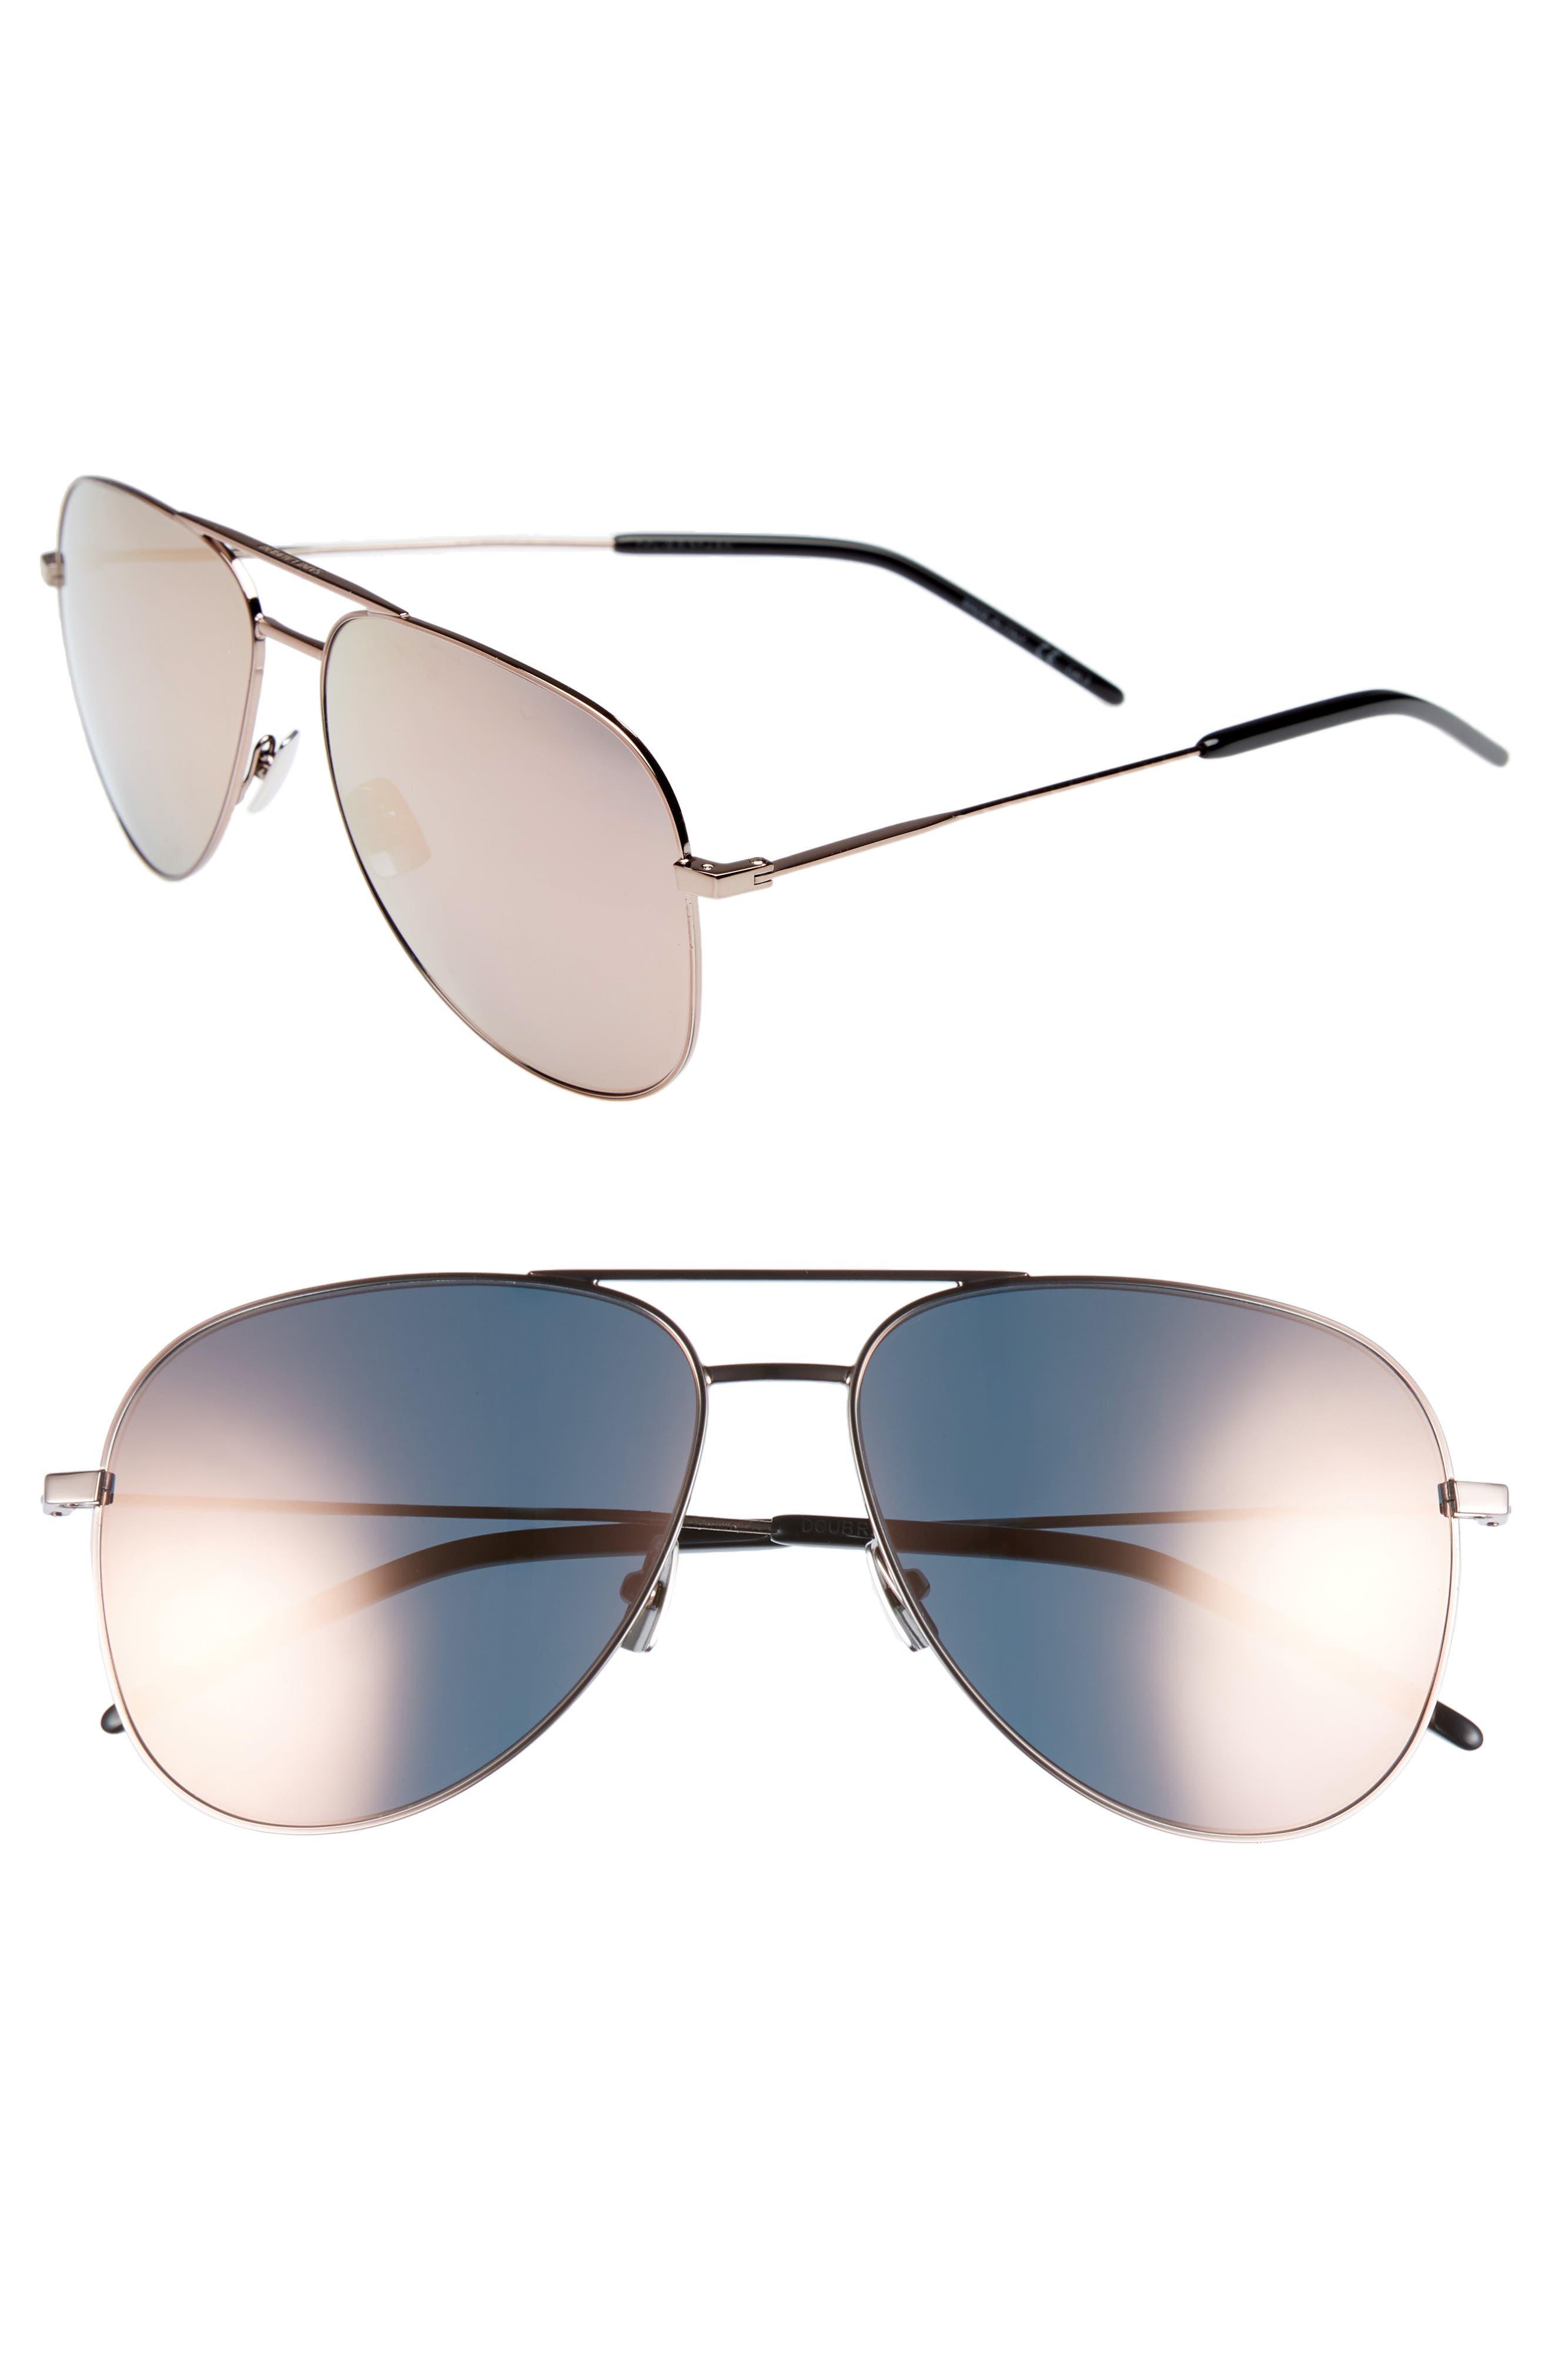 Saint Laurent 59mm Brow Bar Aviator Sunglasses